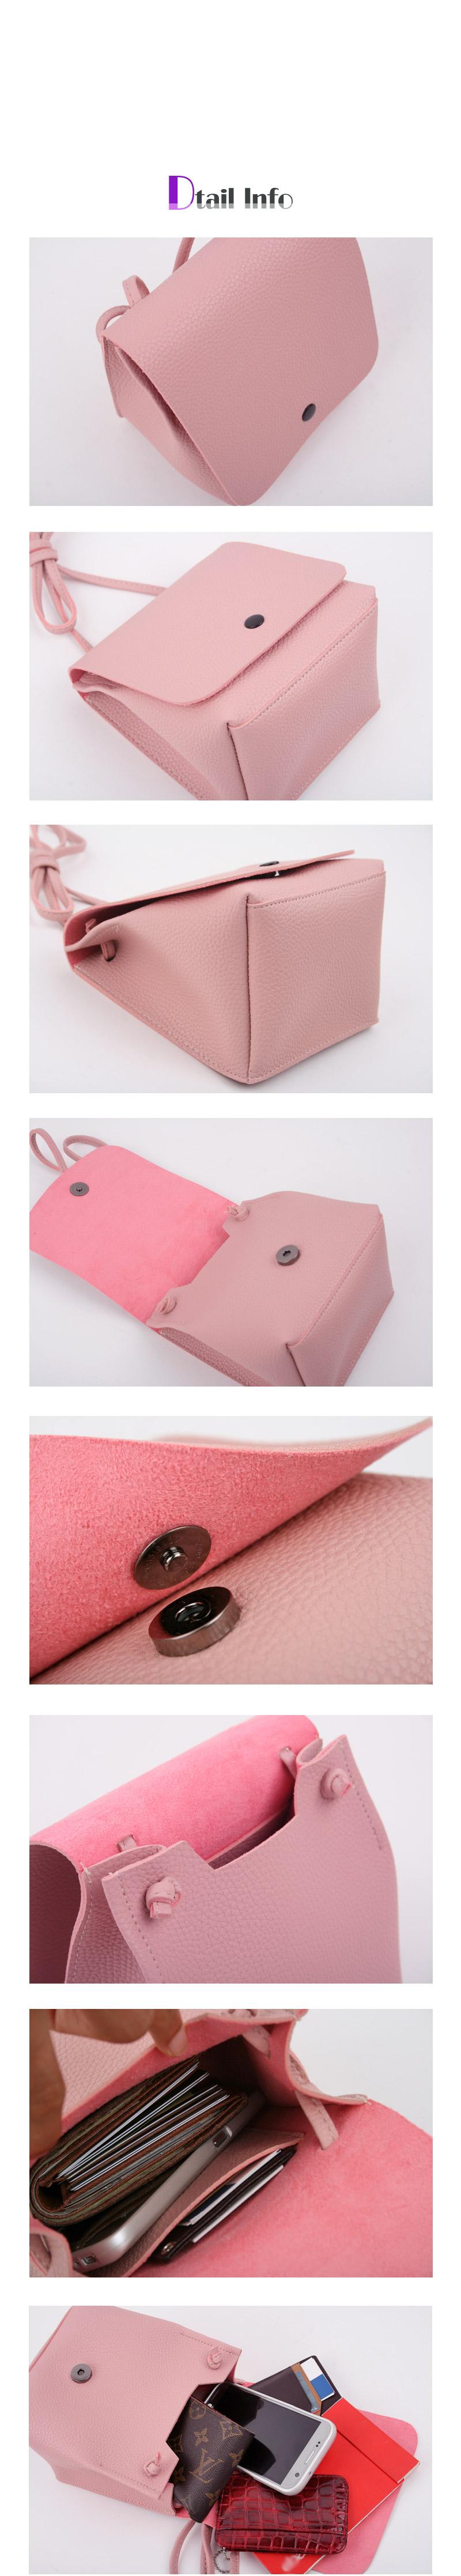 minibag no.K20800view-1